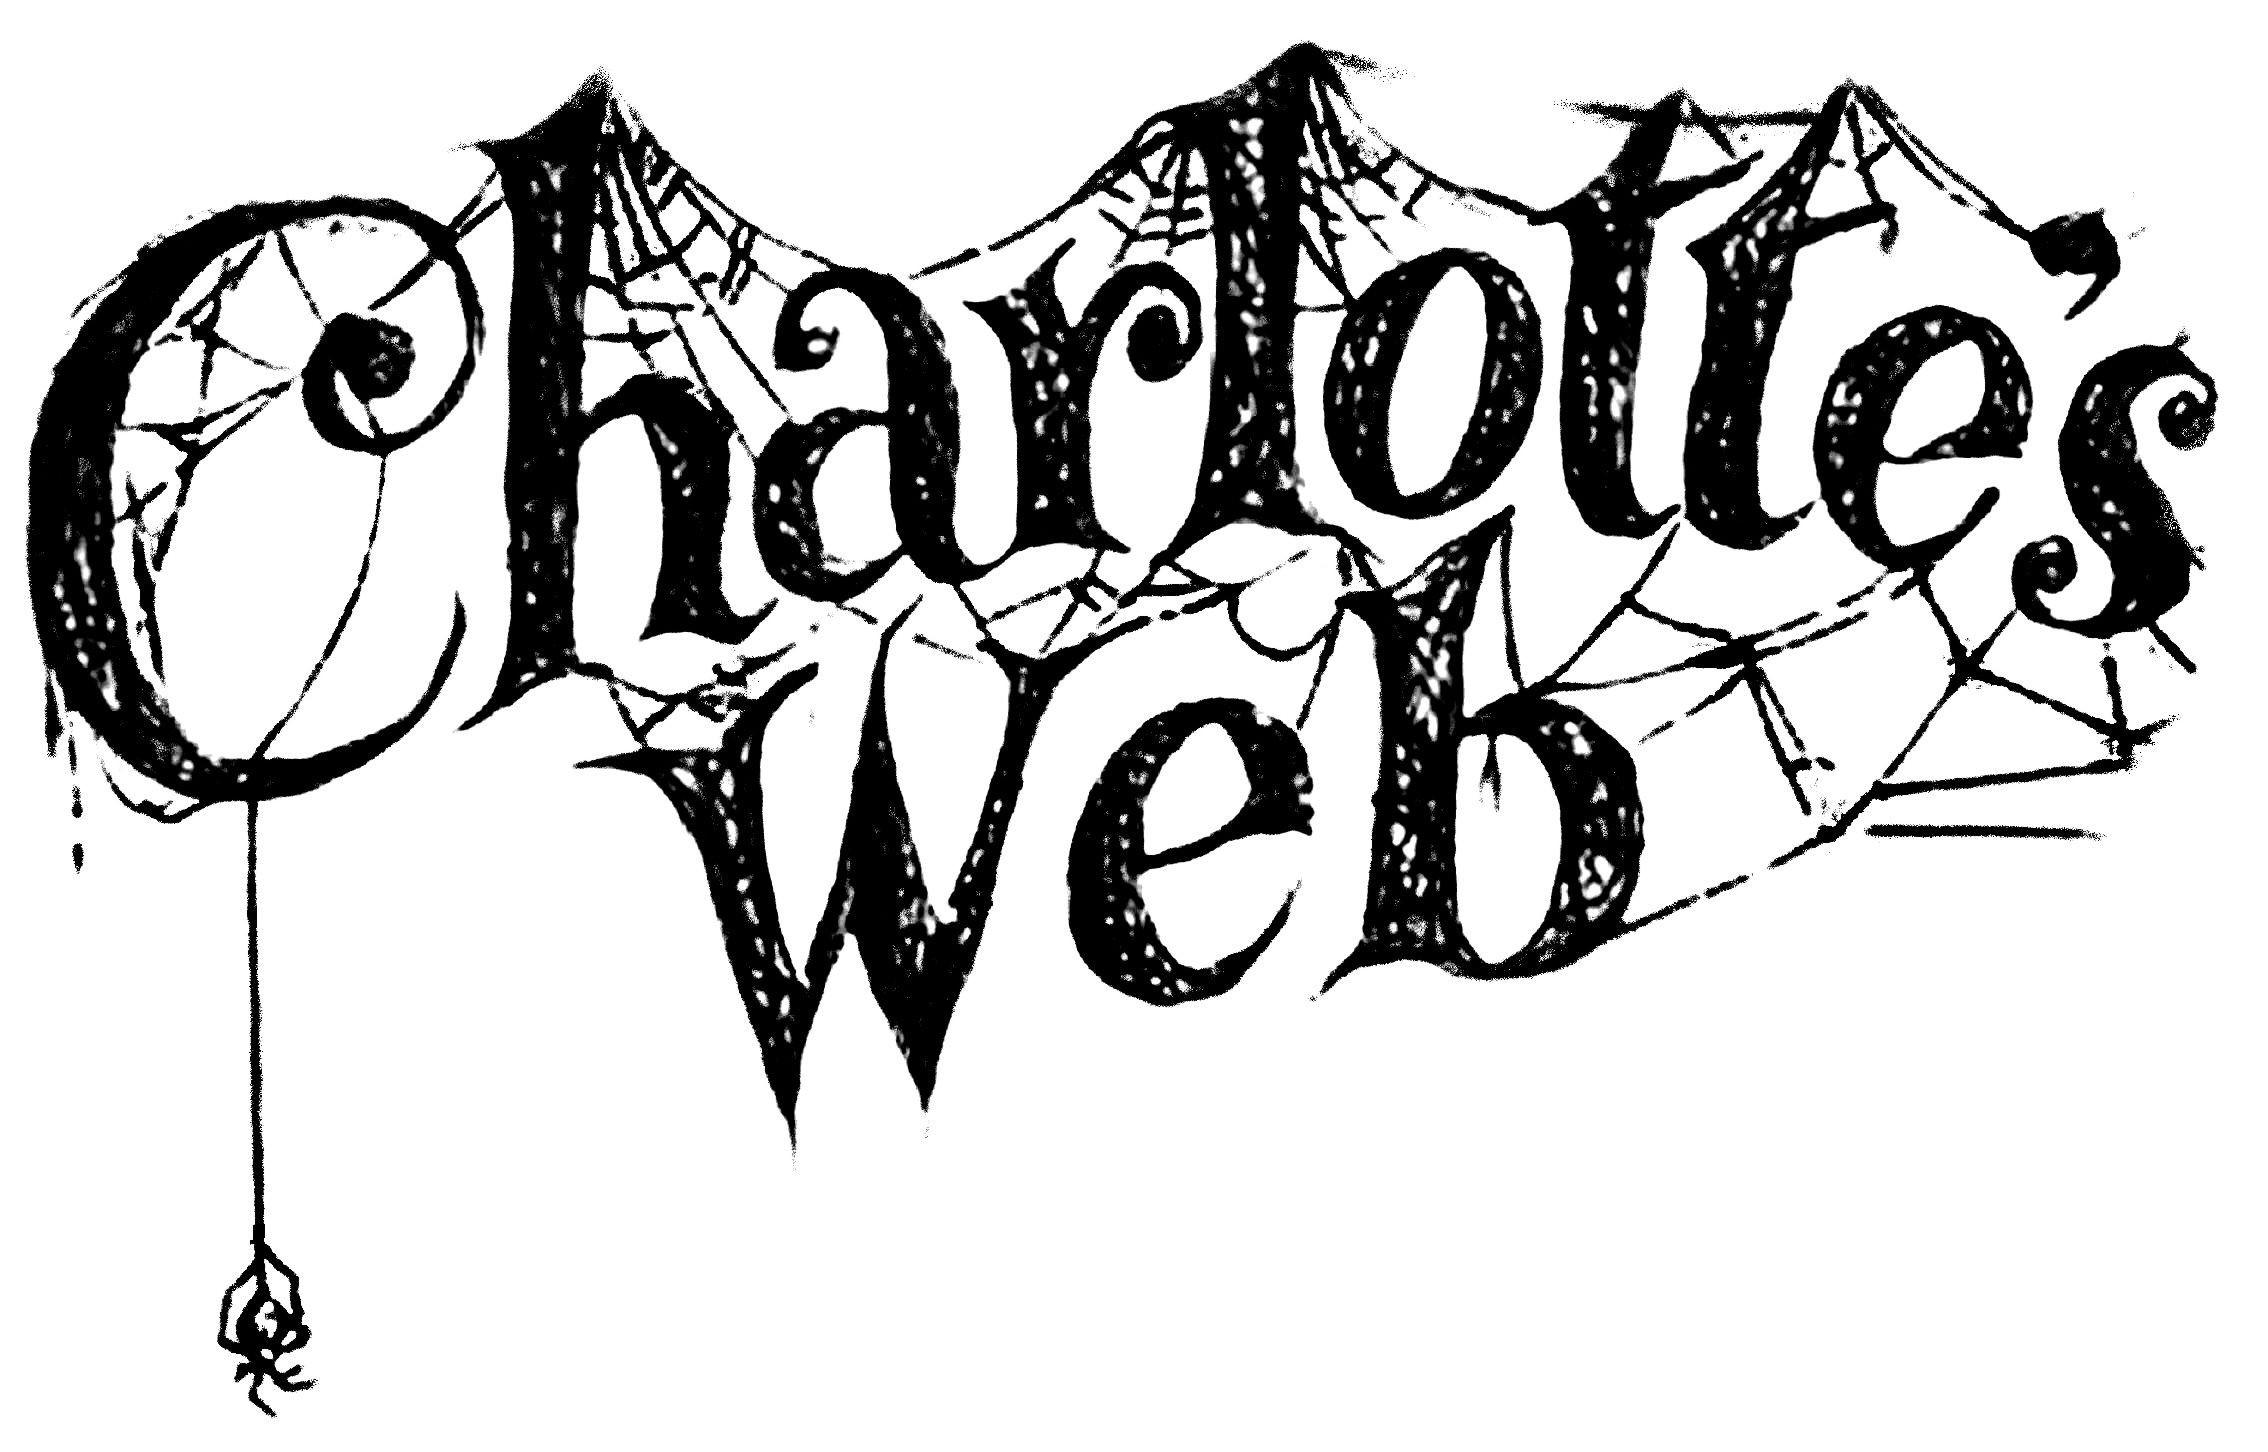 Charlottes web clipart clip art free stock Charlottes web clipart 5 » Clipart Station clip art free stock